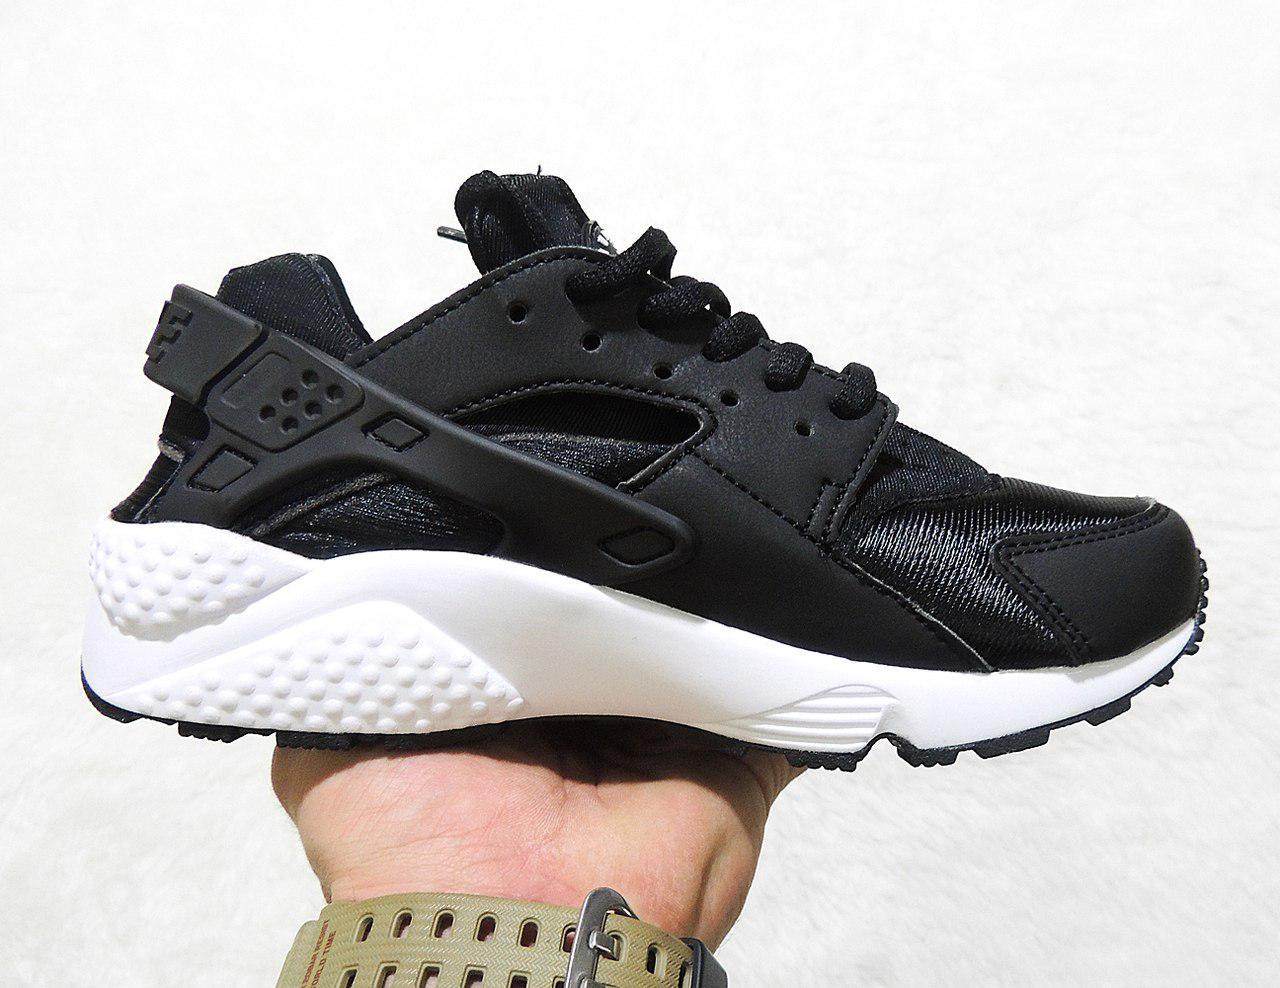 5345e0ba8c5d Кроссовки женские Nike Air Huarache 1 Black White топ реплика -  Интернет-магазин обуви и